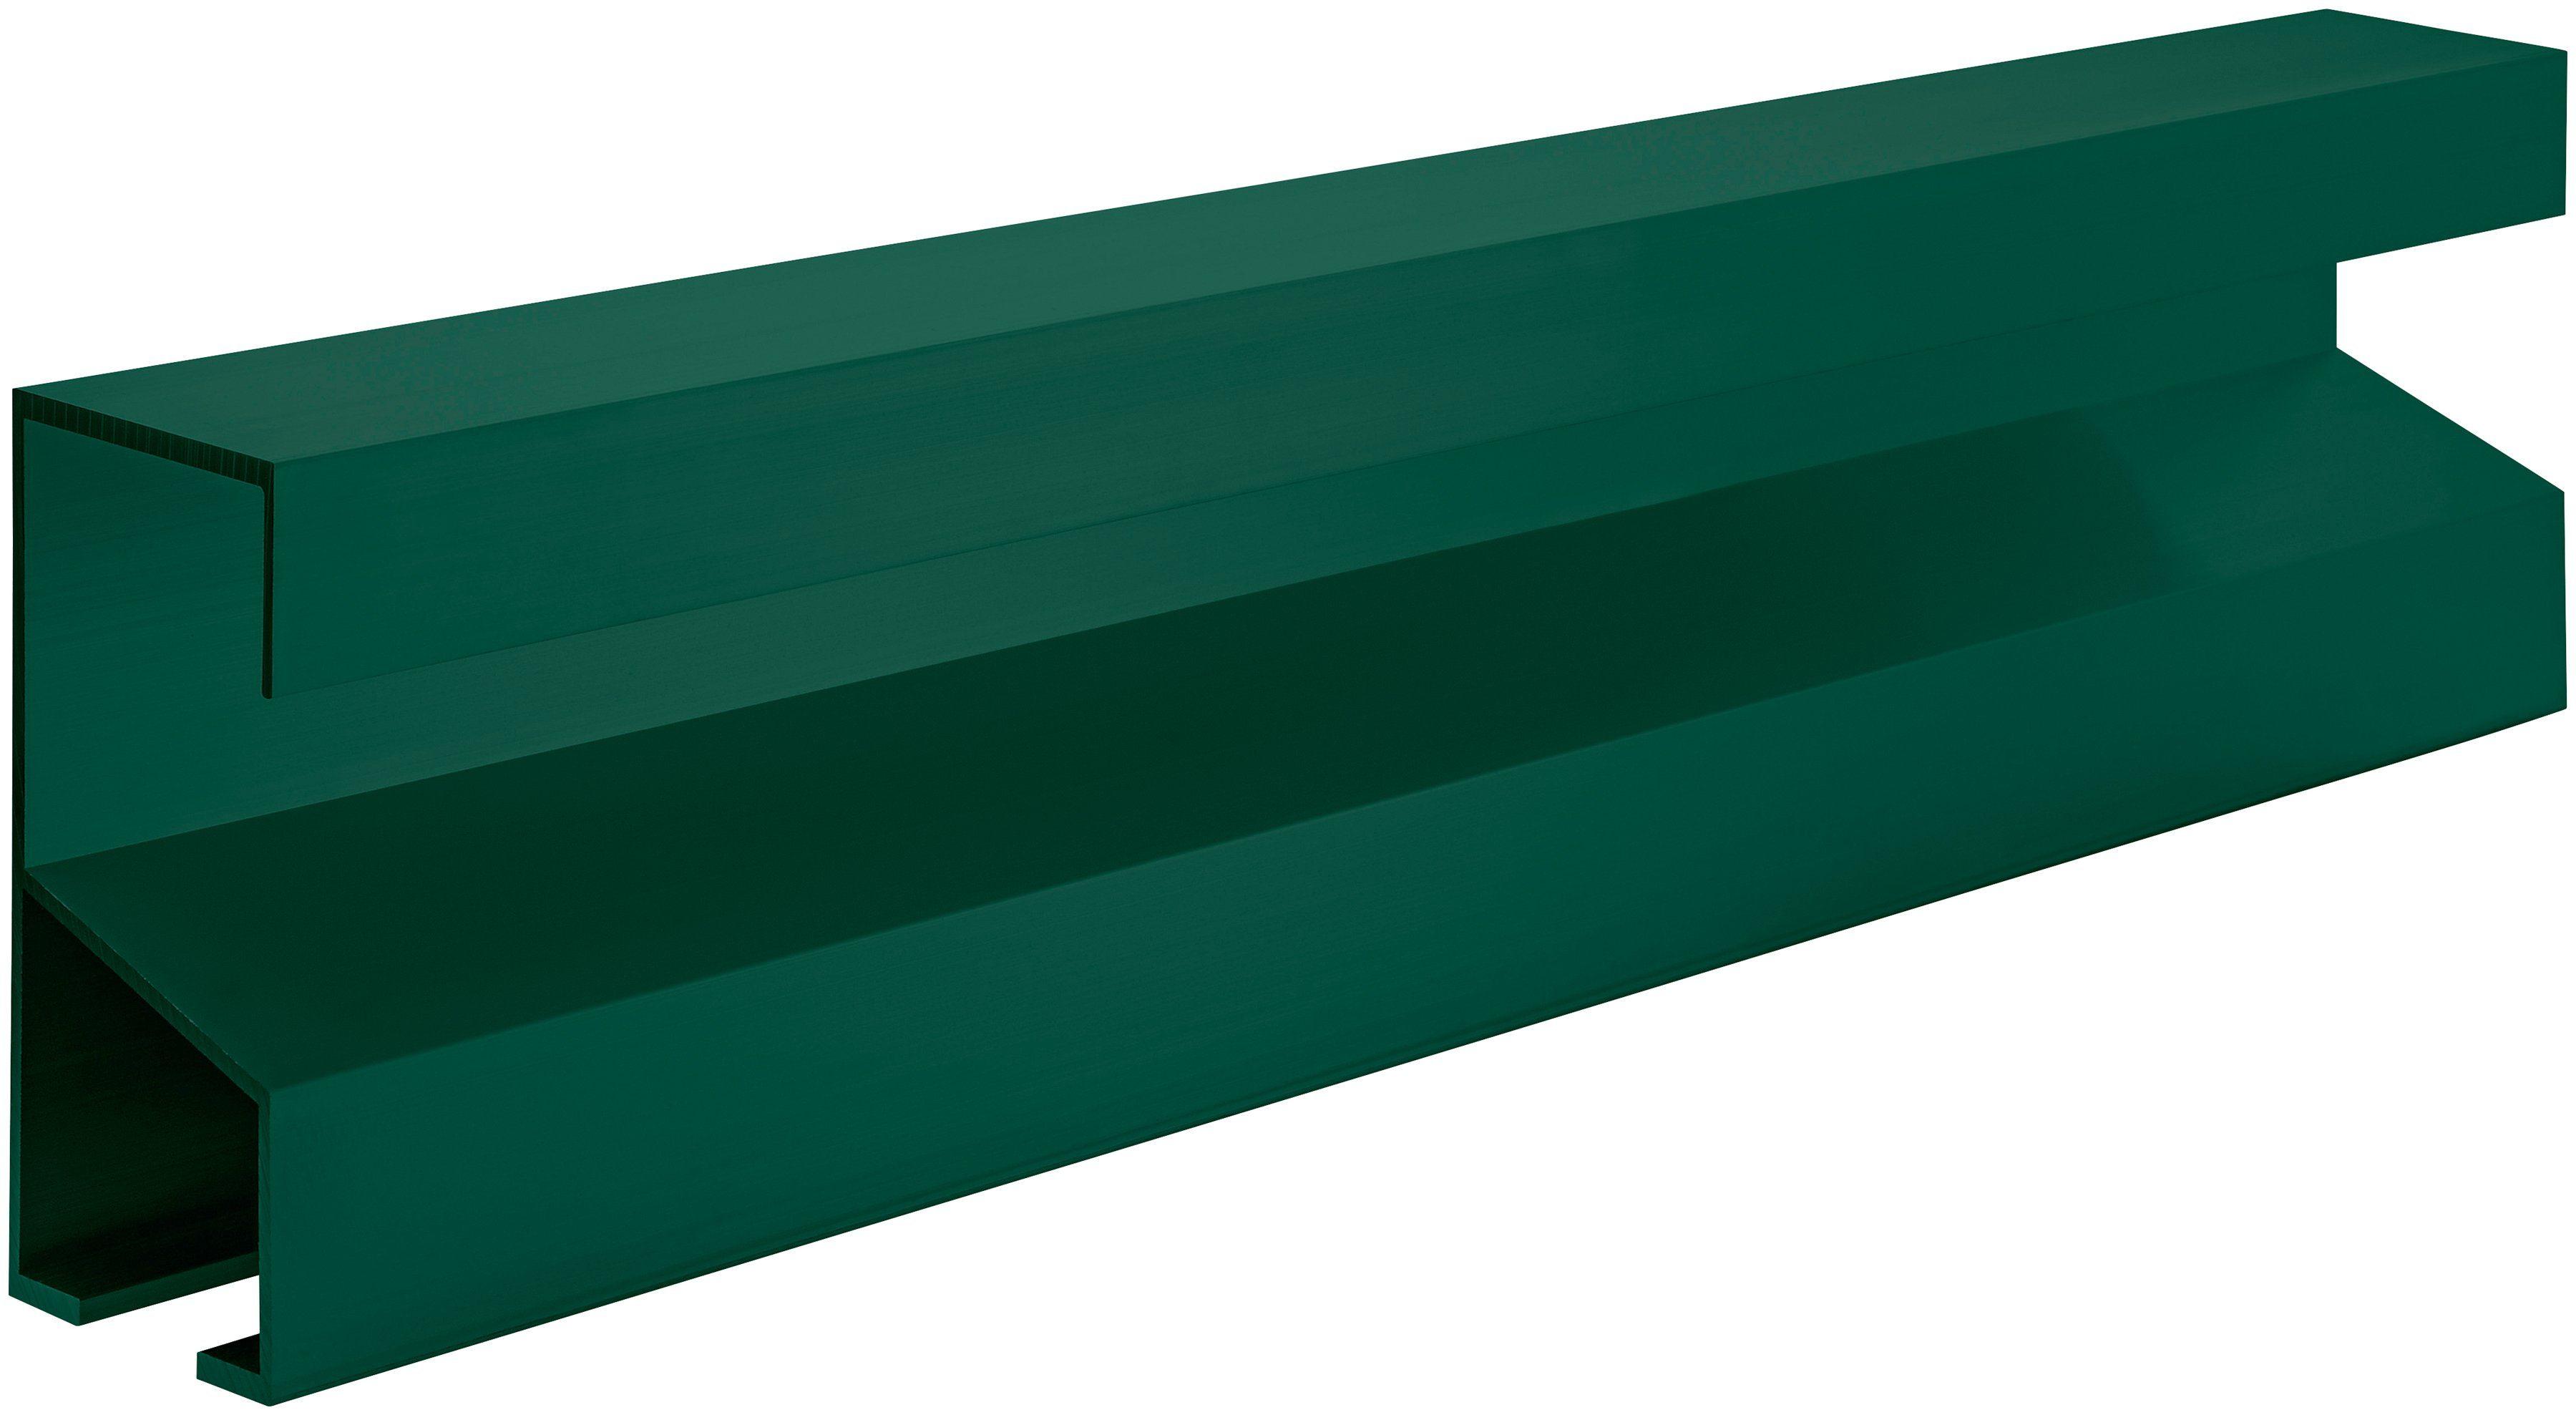 Beckmann Fundamentrahmen, BxT: 256x196 cm, grün